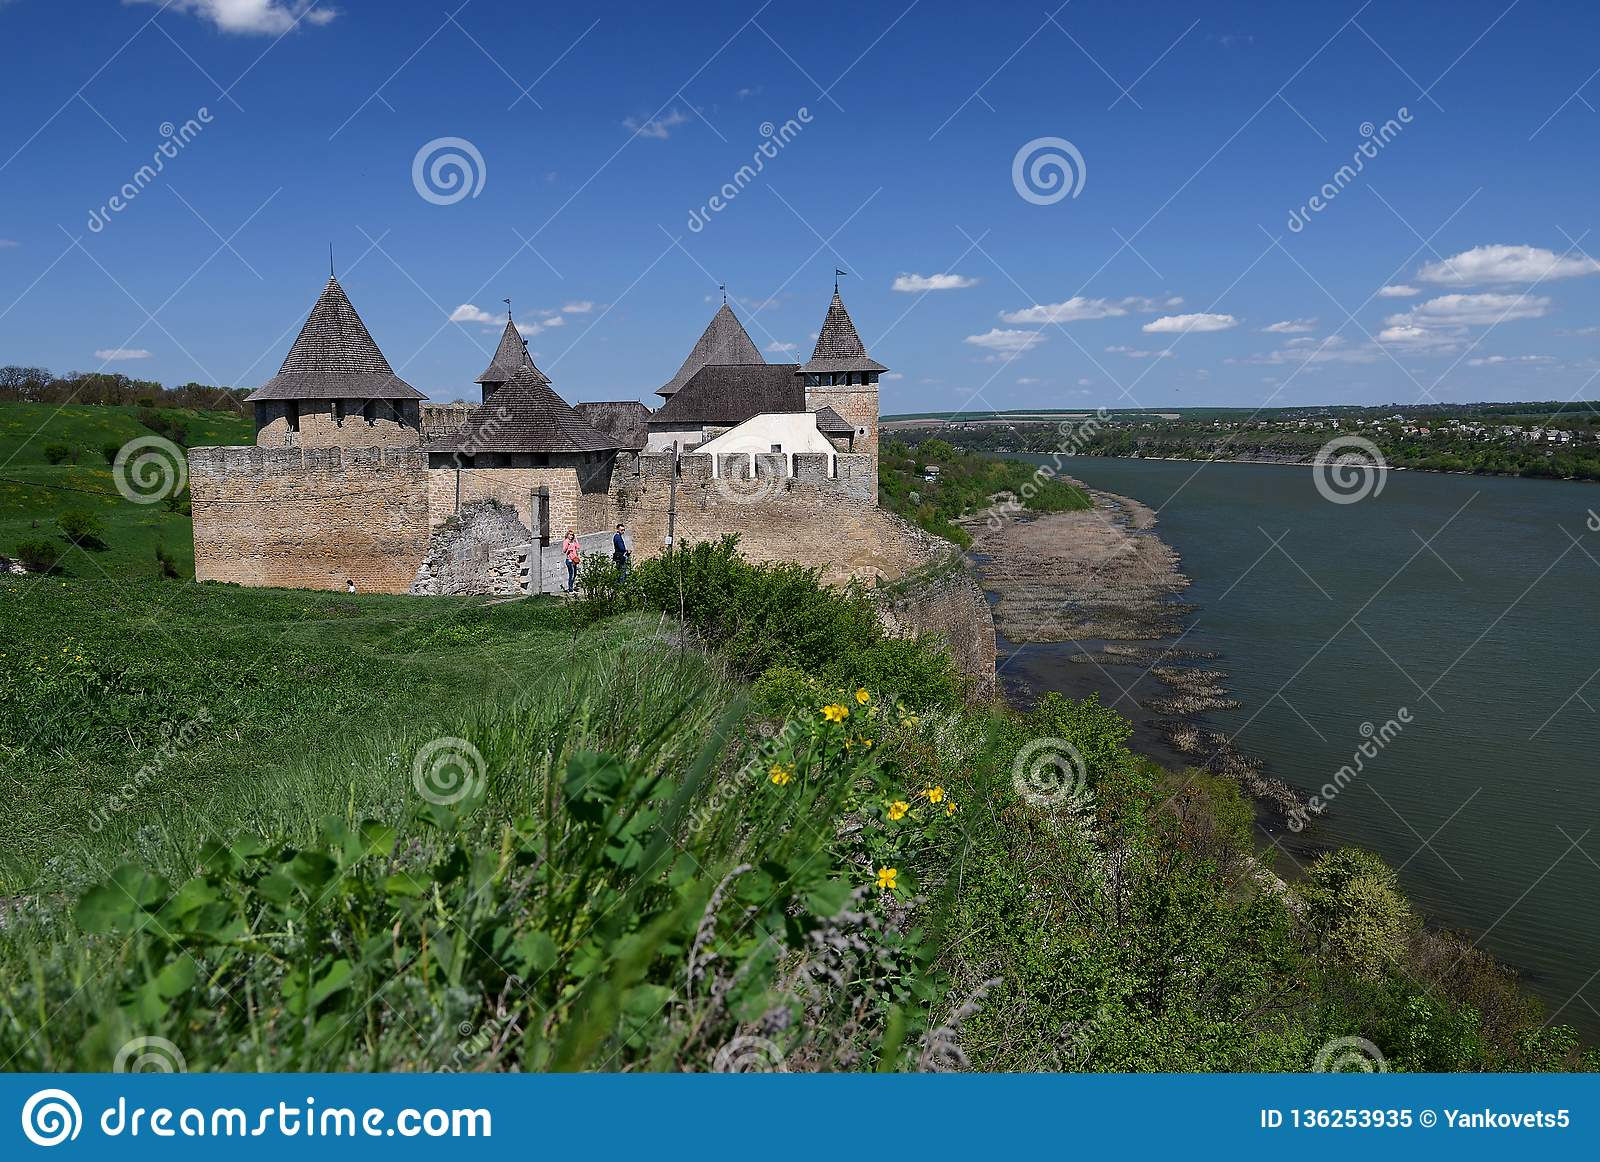 Ukraina, Hotinskaya forteca pod niebieskim niebem na Maju 3, 2015